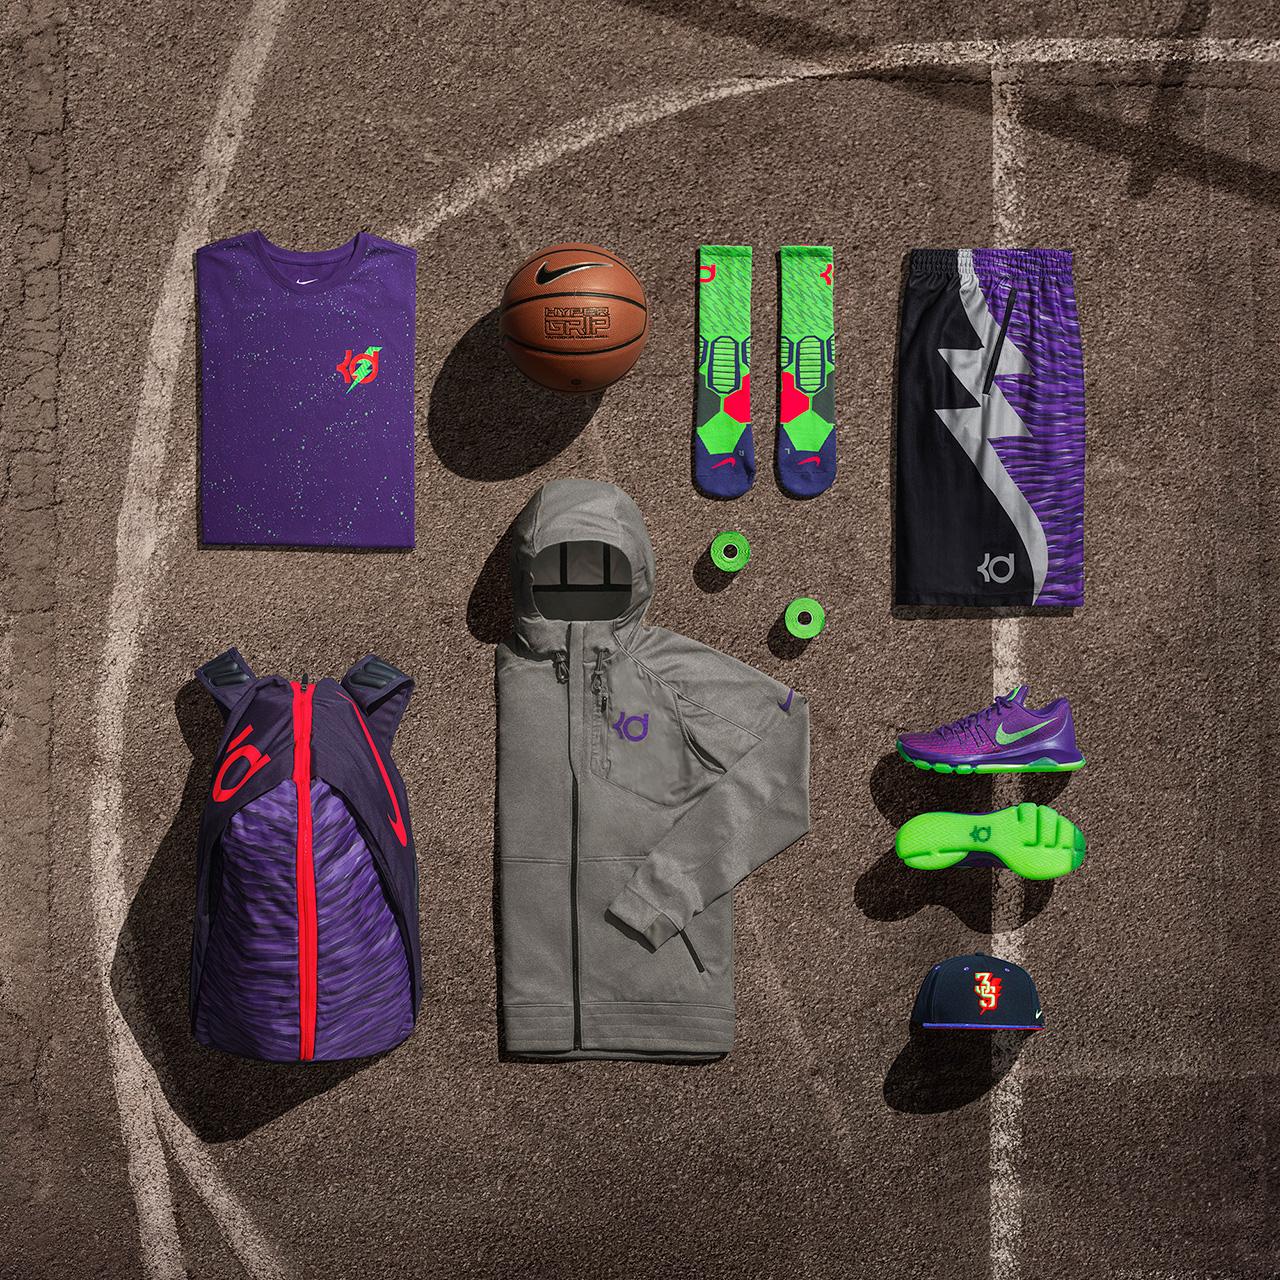 03_JR_20150613_Nike_Textures_02812_KD_HFR3